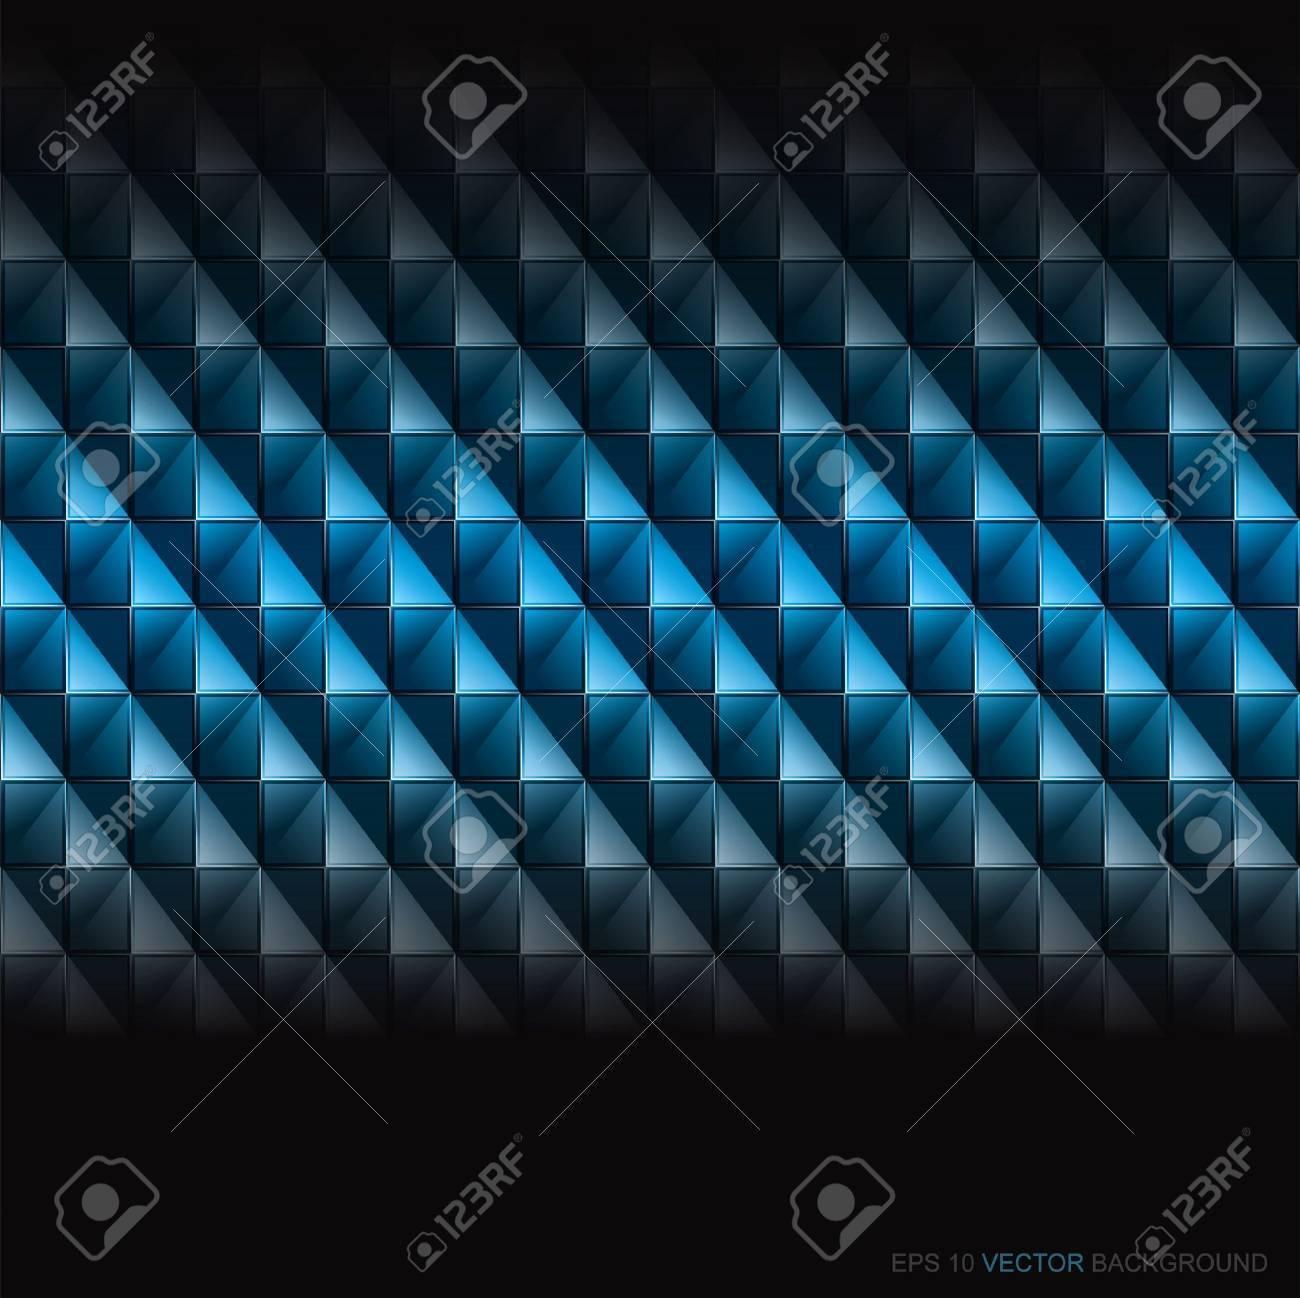 Abstract Blue Diamond background.  vector. Eps 10. Stock Vector - 11813598